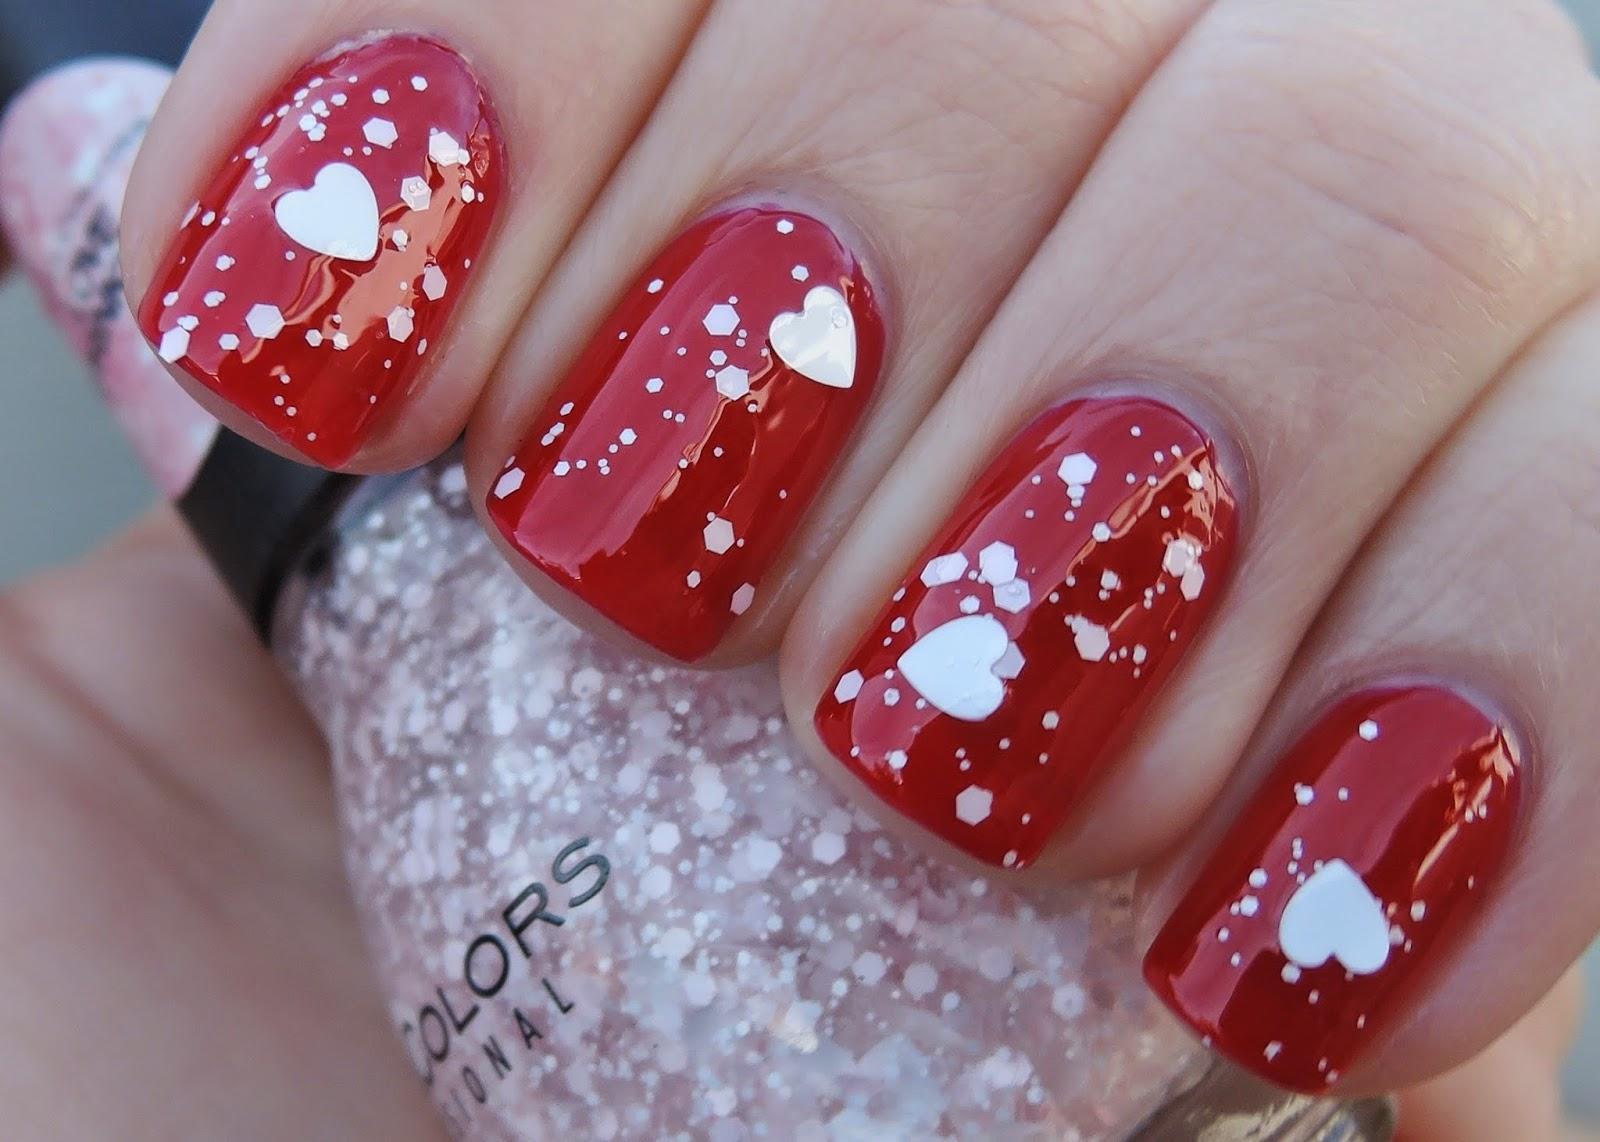 SinfulColors Love Sprinkles